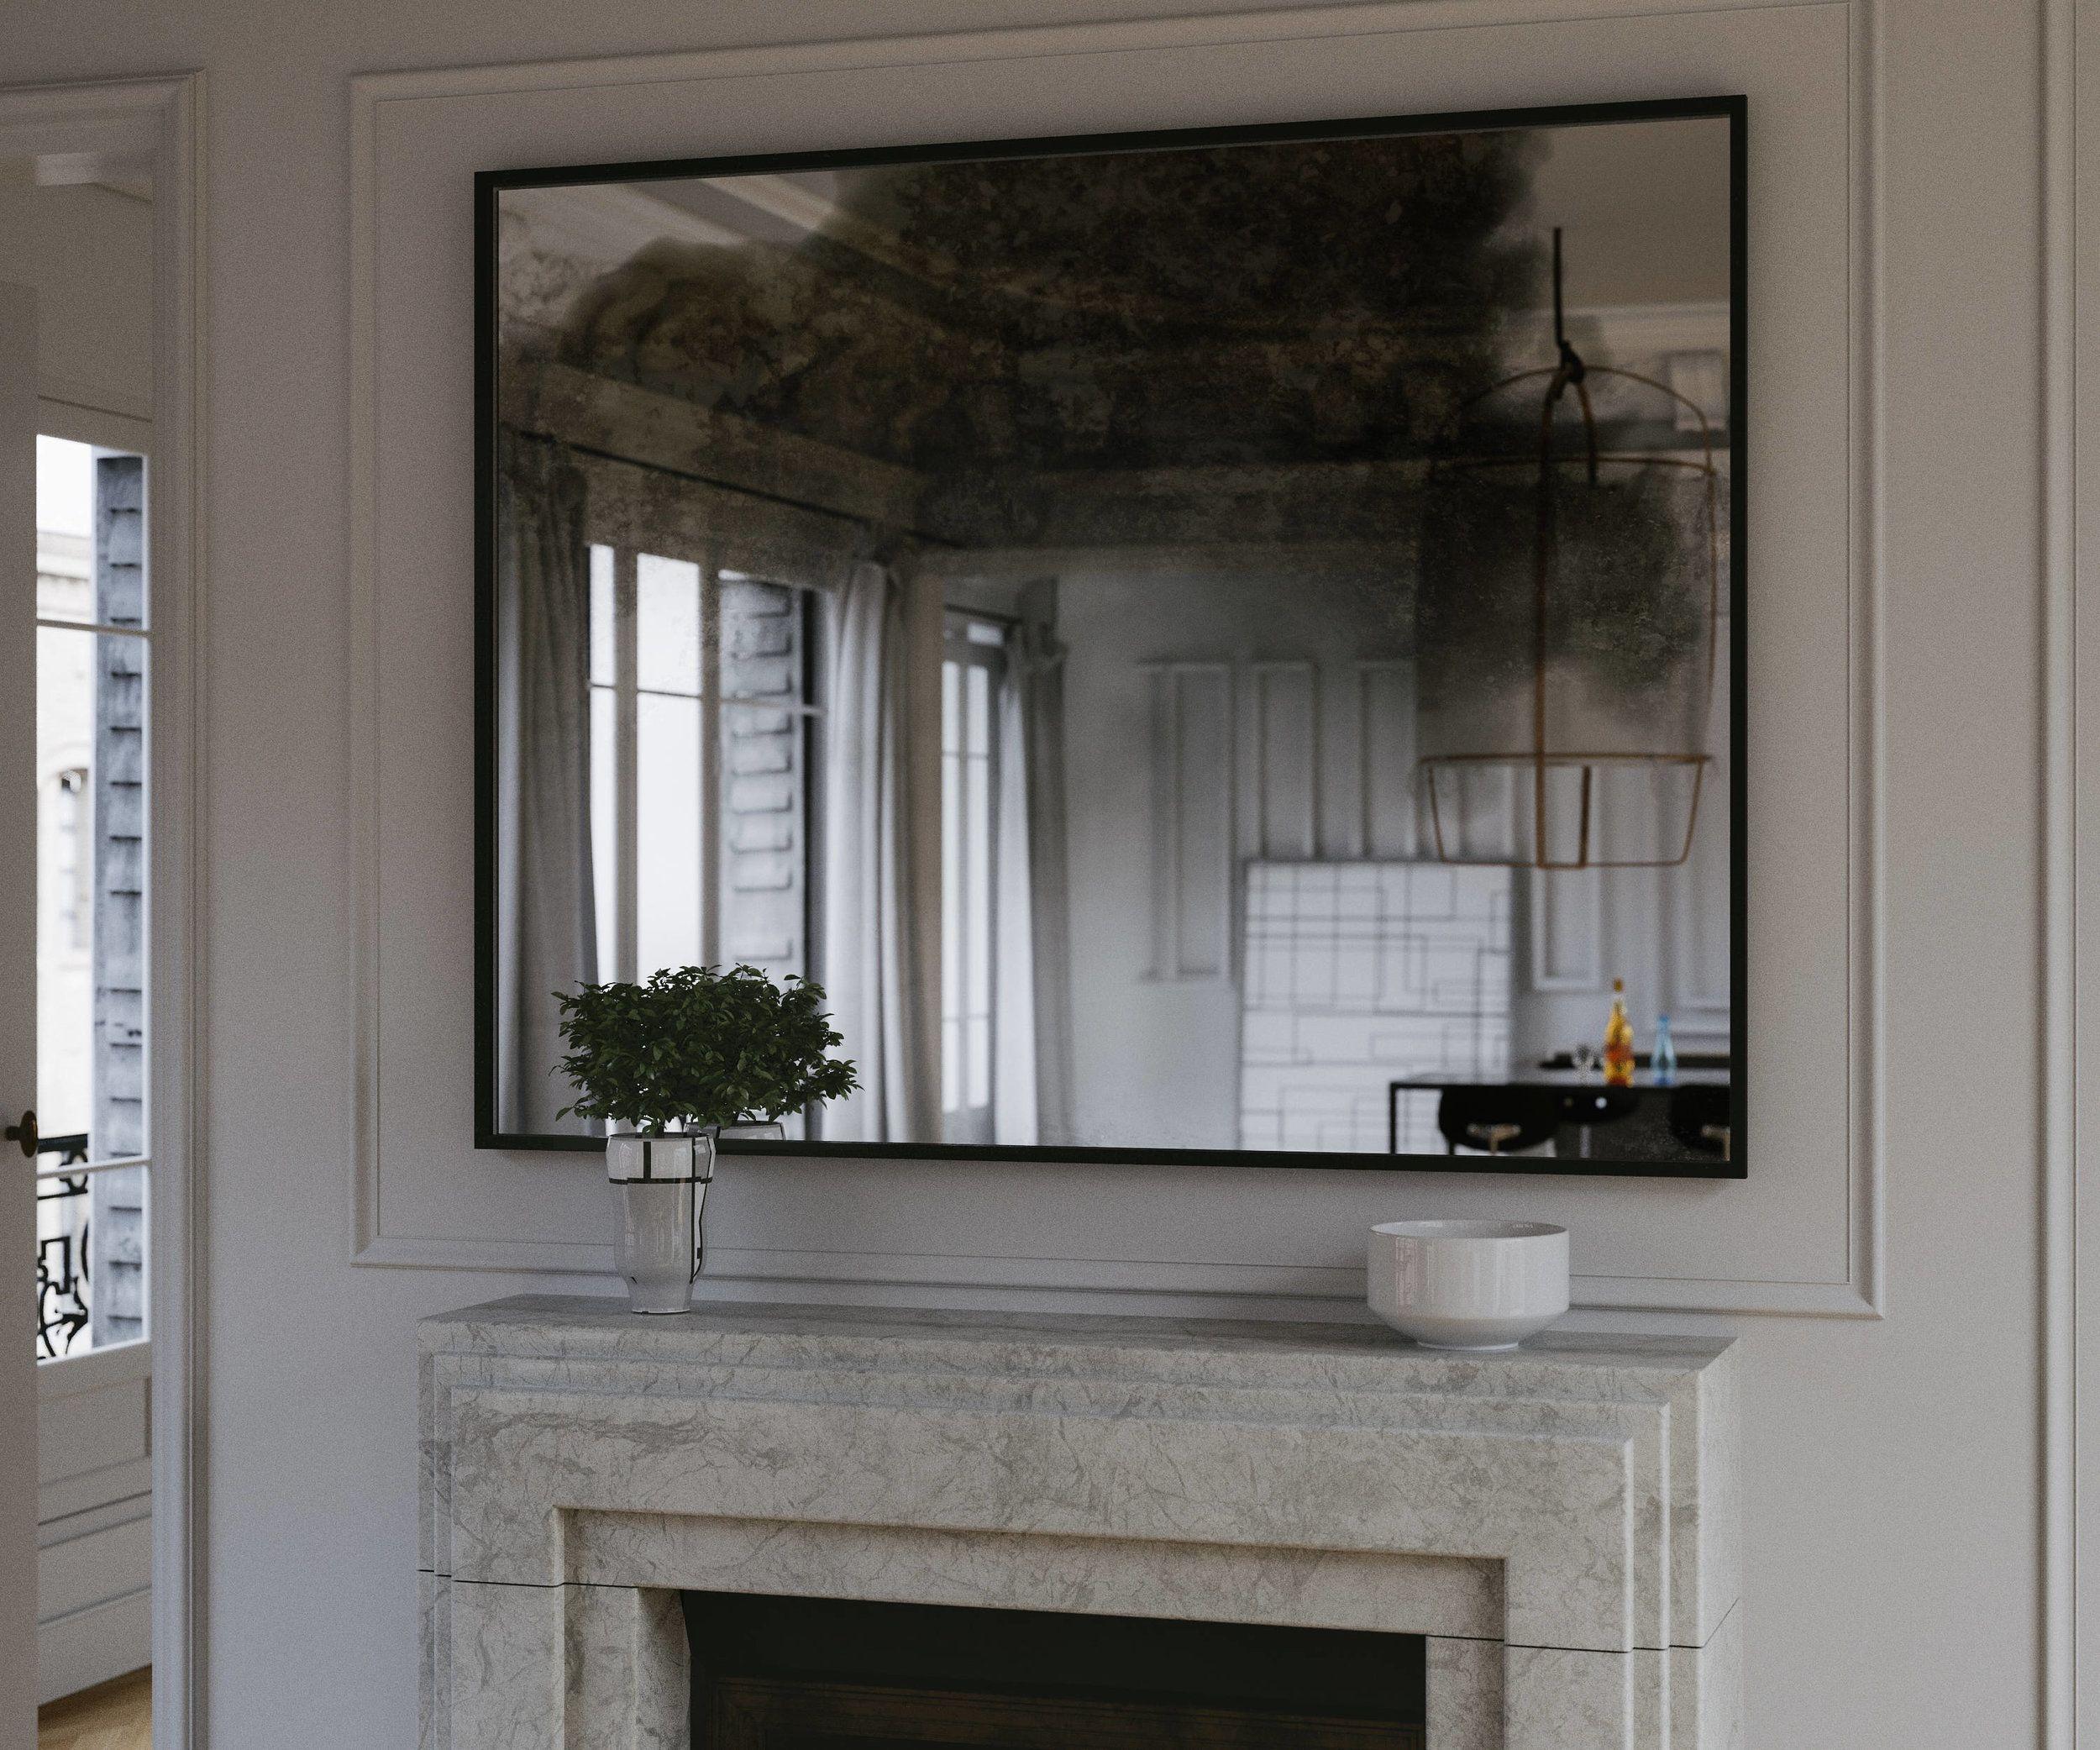 36 X 32 Mirror With Iron Black Frame Custom Modern Hanging Etsy Lighted Wall Mirror Mirror Design Wall Framed Mirror Wall